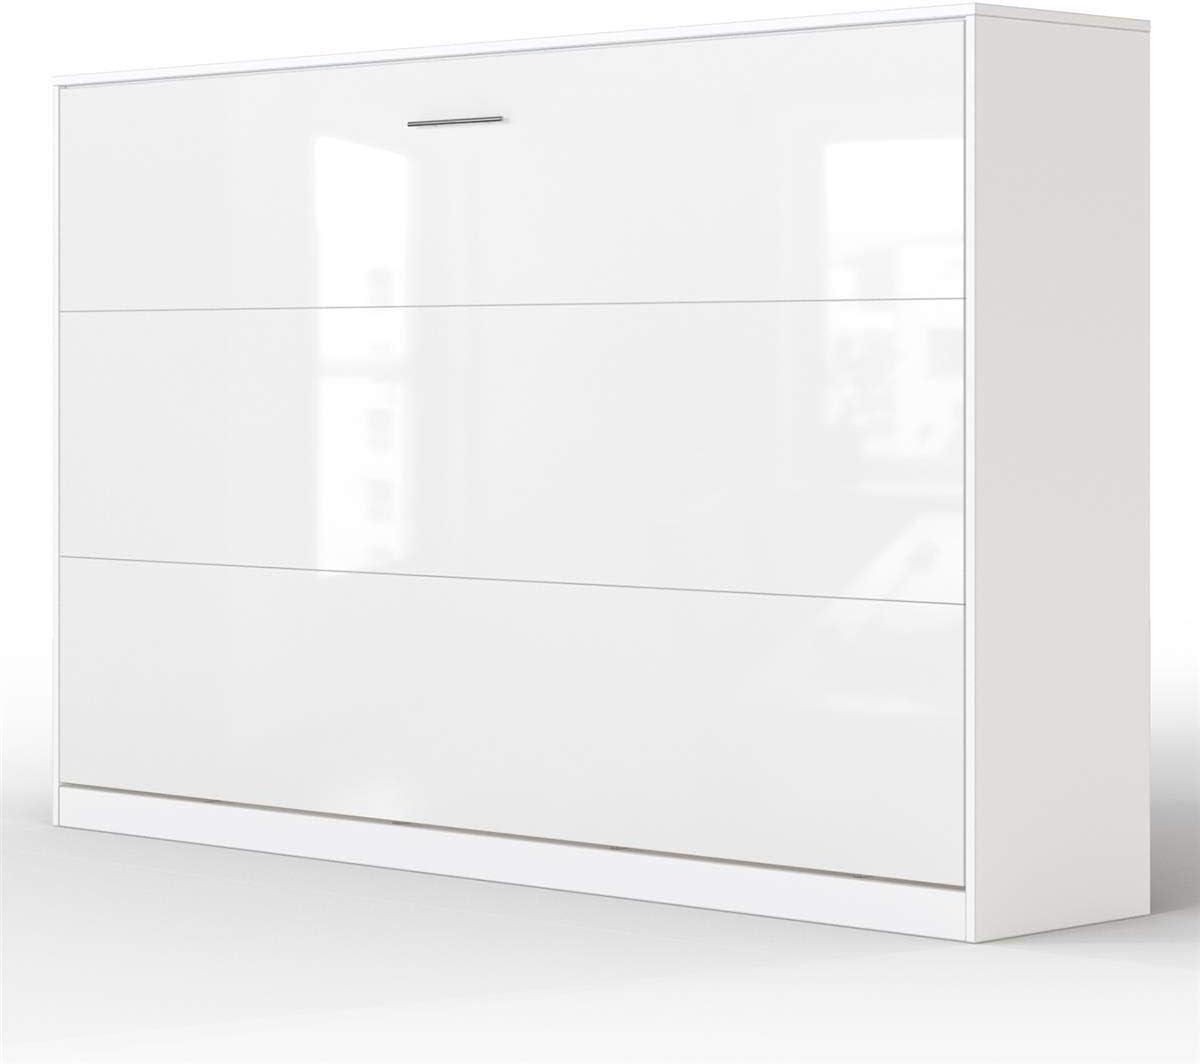 SMARTBett Basic Cama abatible Cama Plegable Cama de Pared (Blanco/Blanco Brillante, 120 x 200 cm Horizontal)